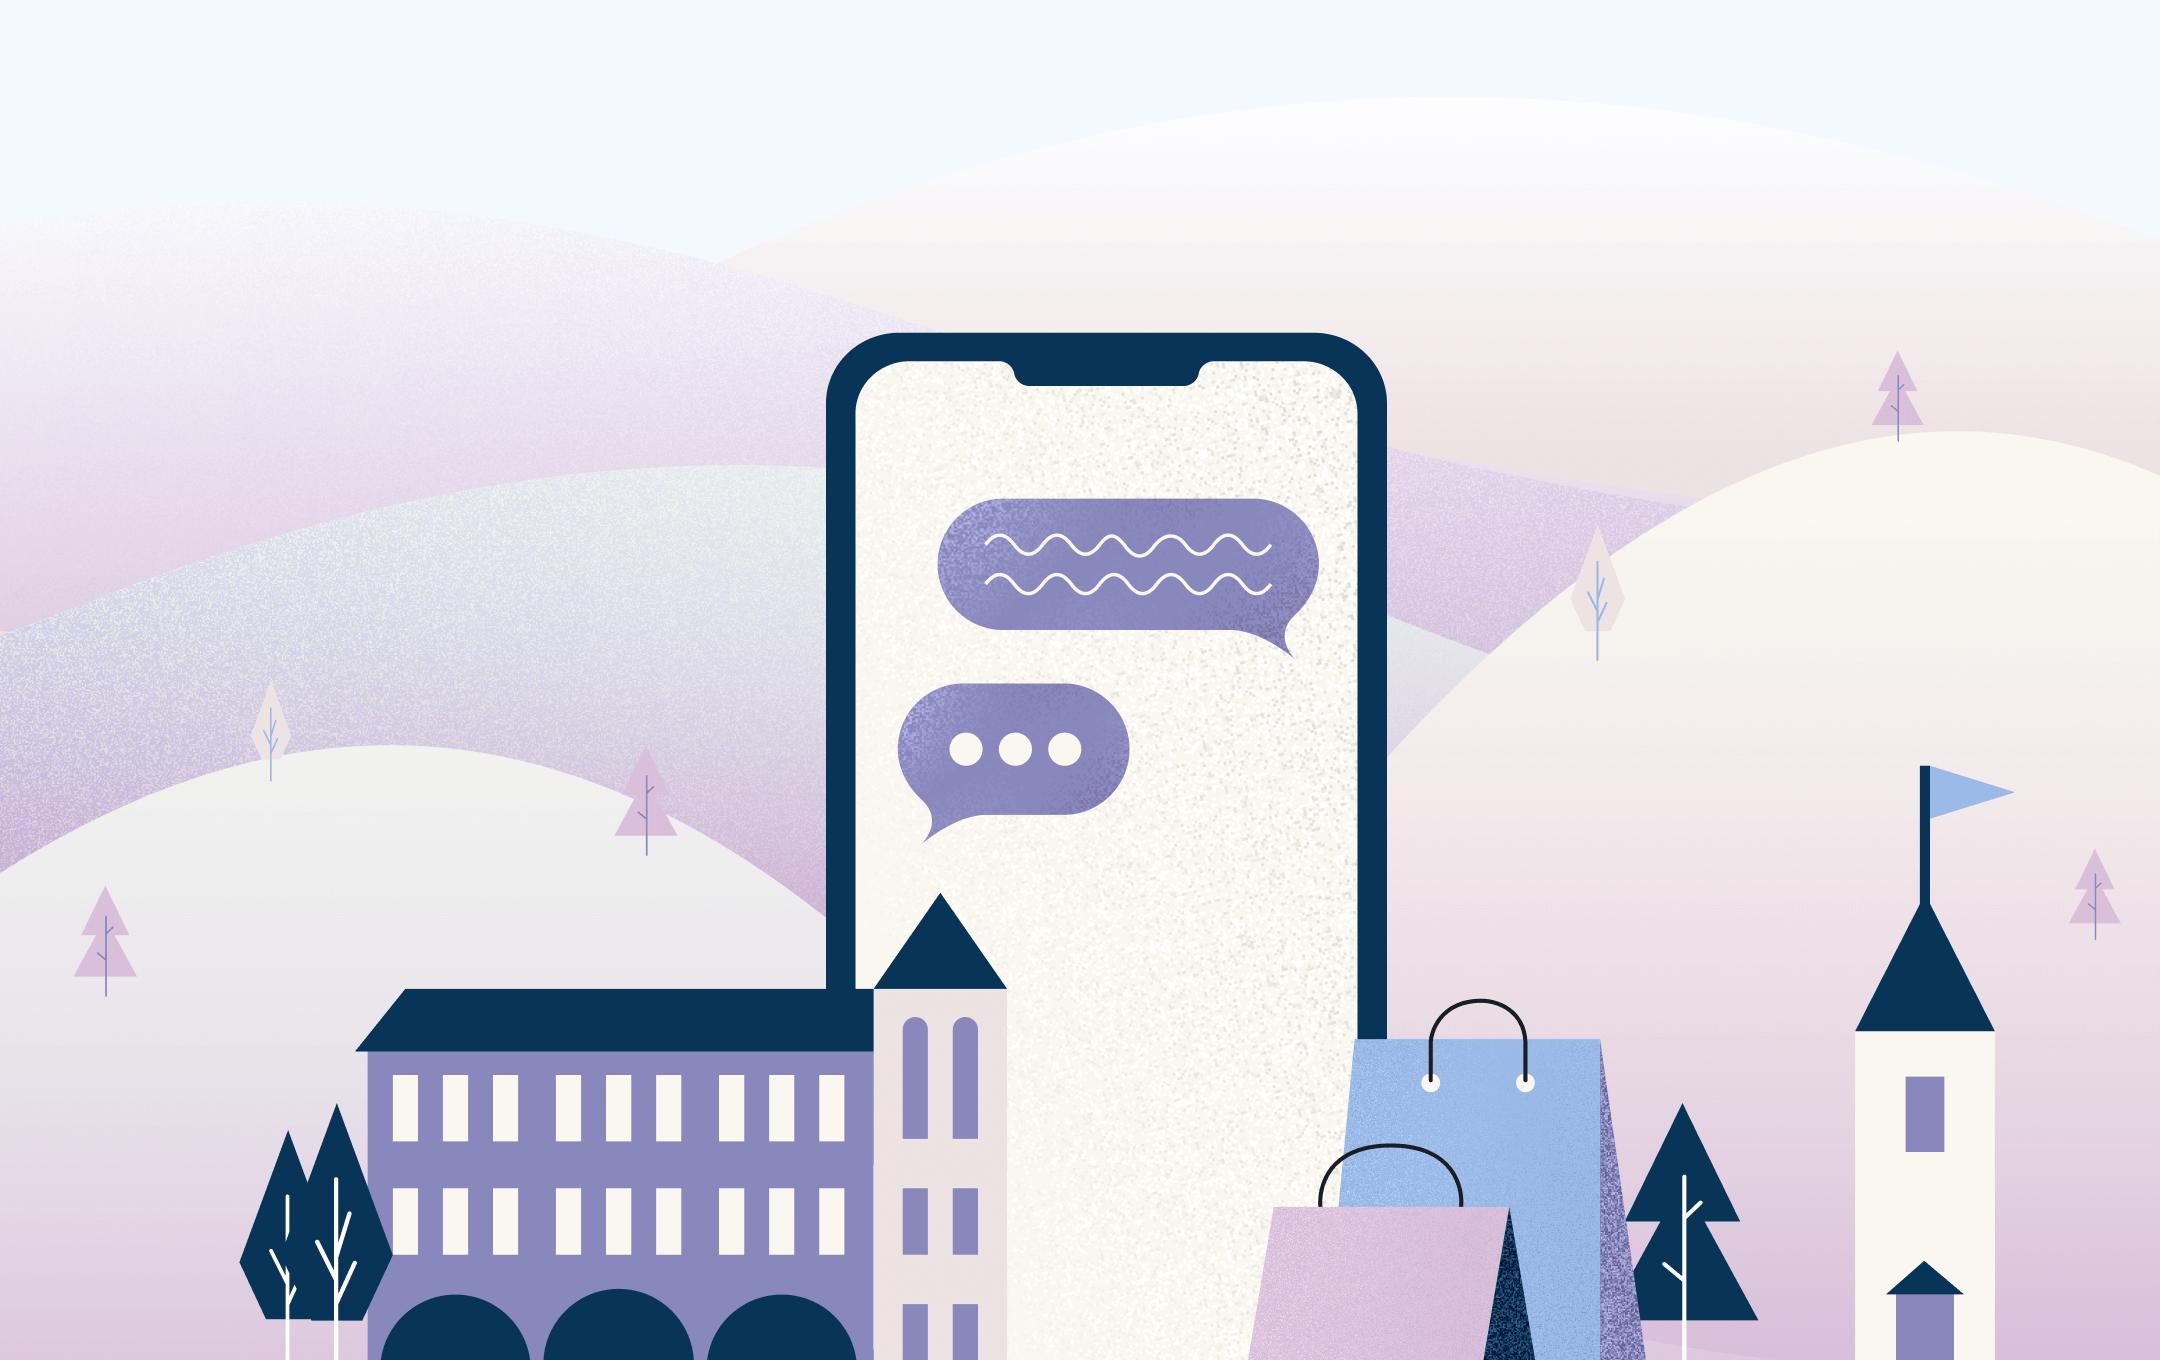 SMS holiday marketing ideas